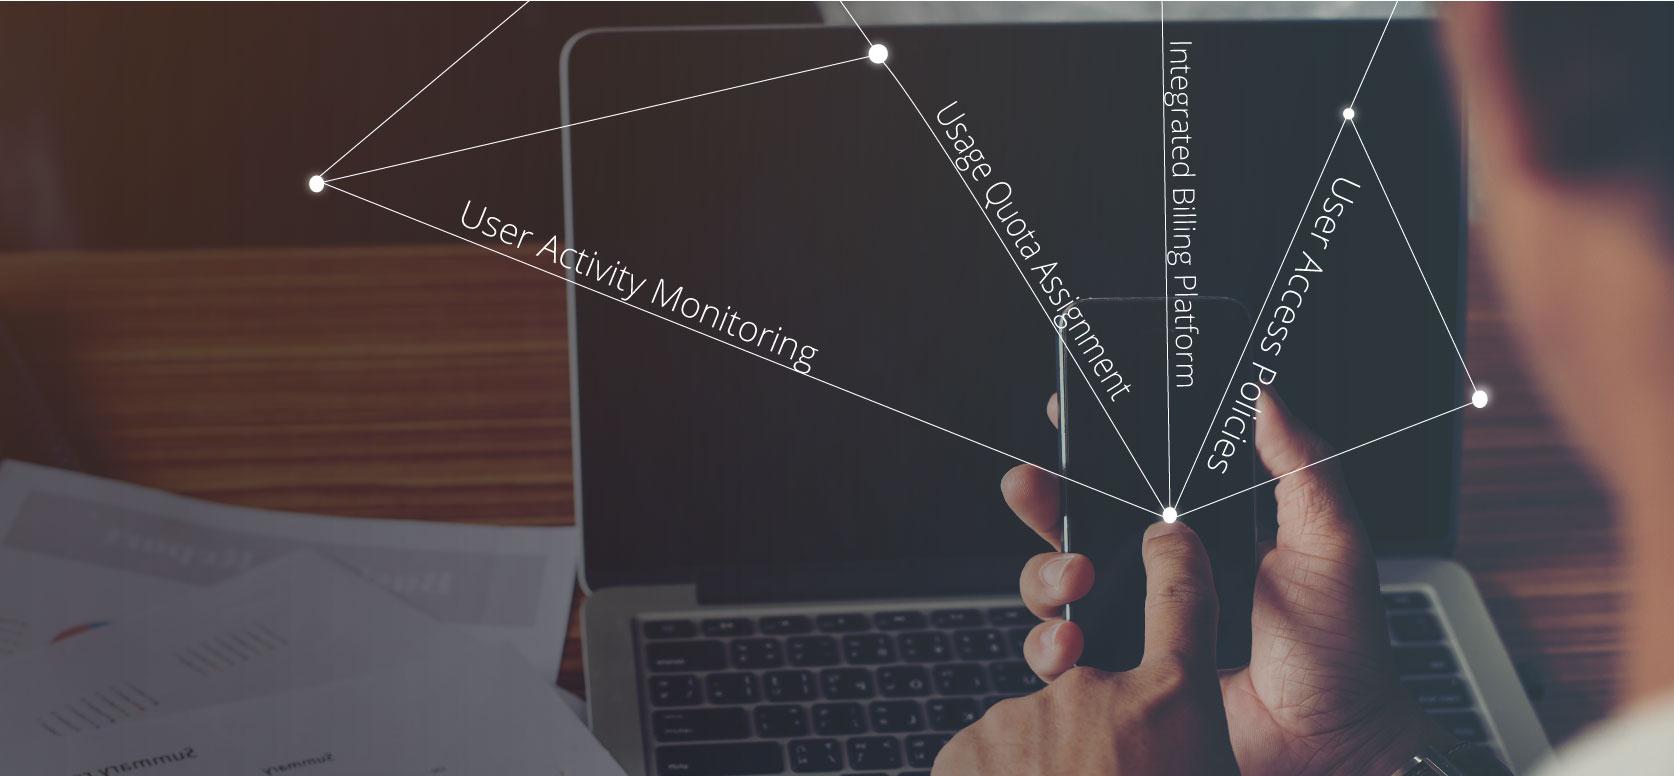 Edgecore WiFi Solution, User Authentication